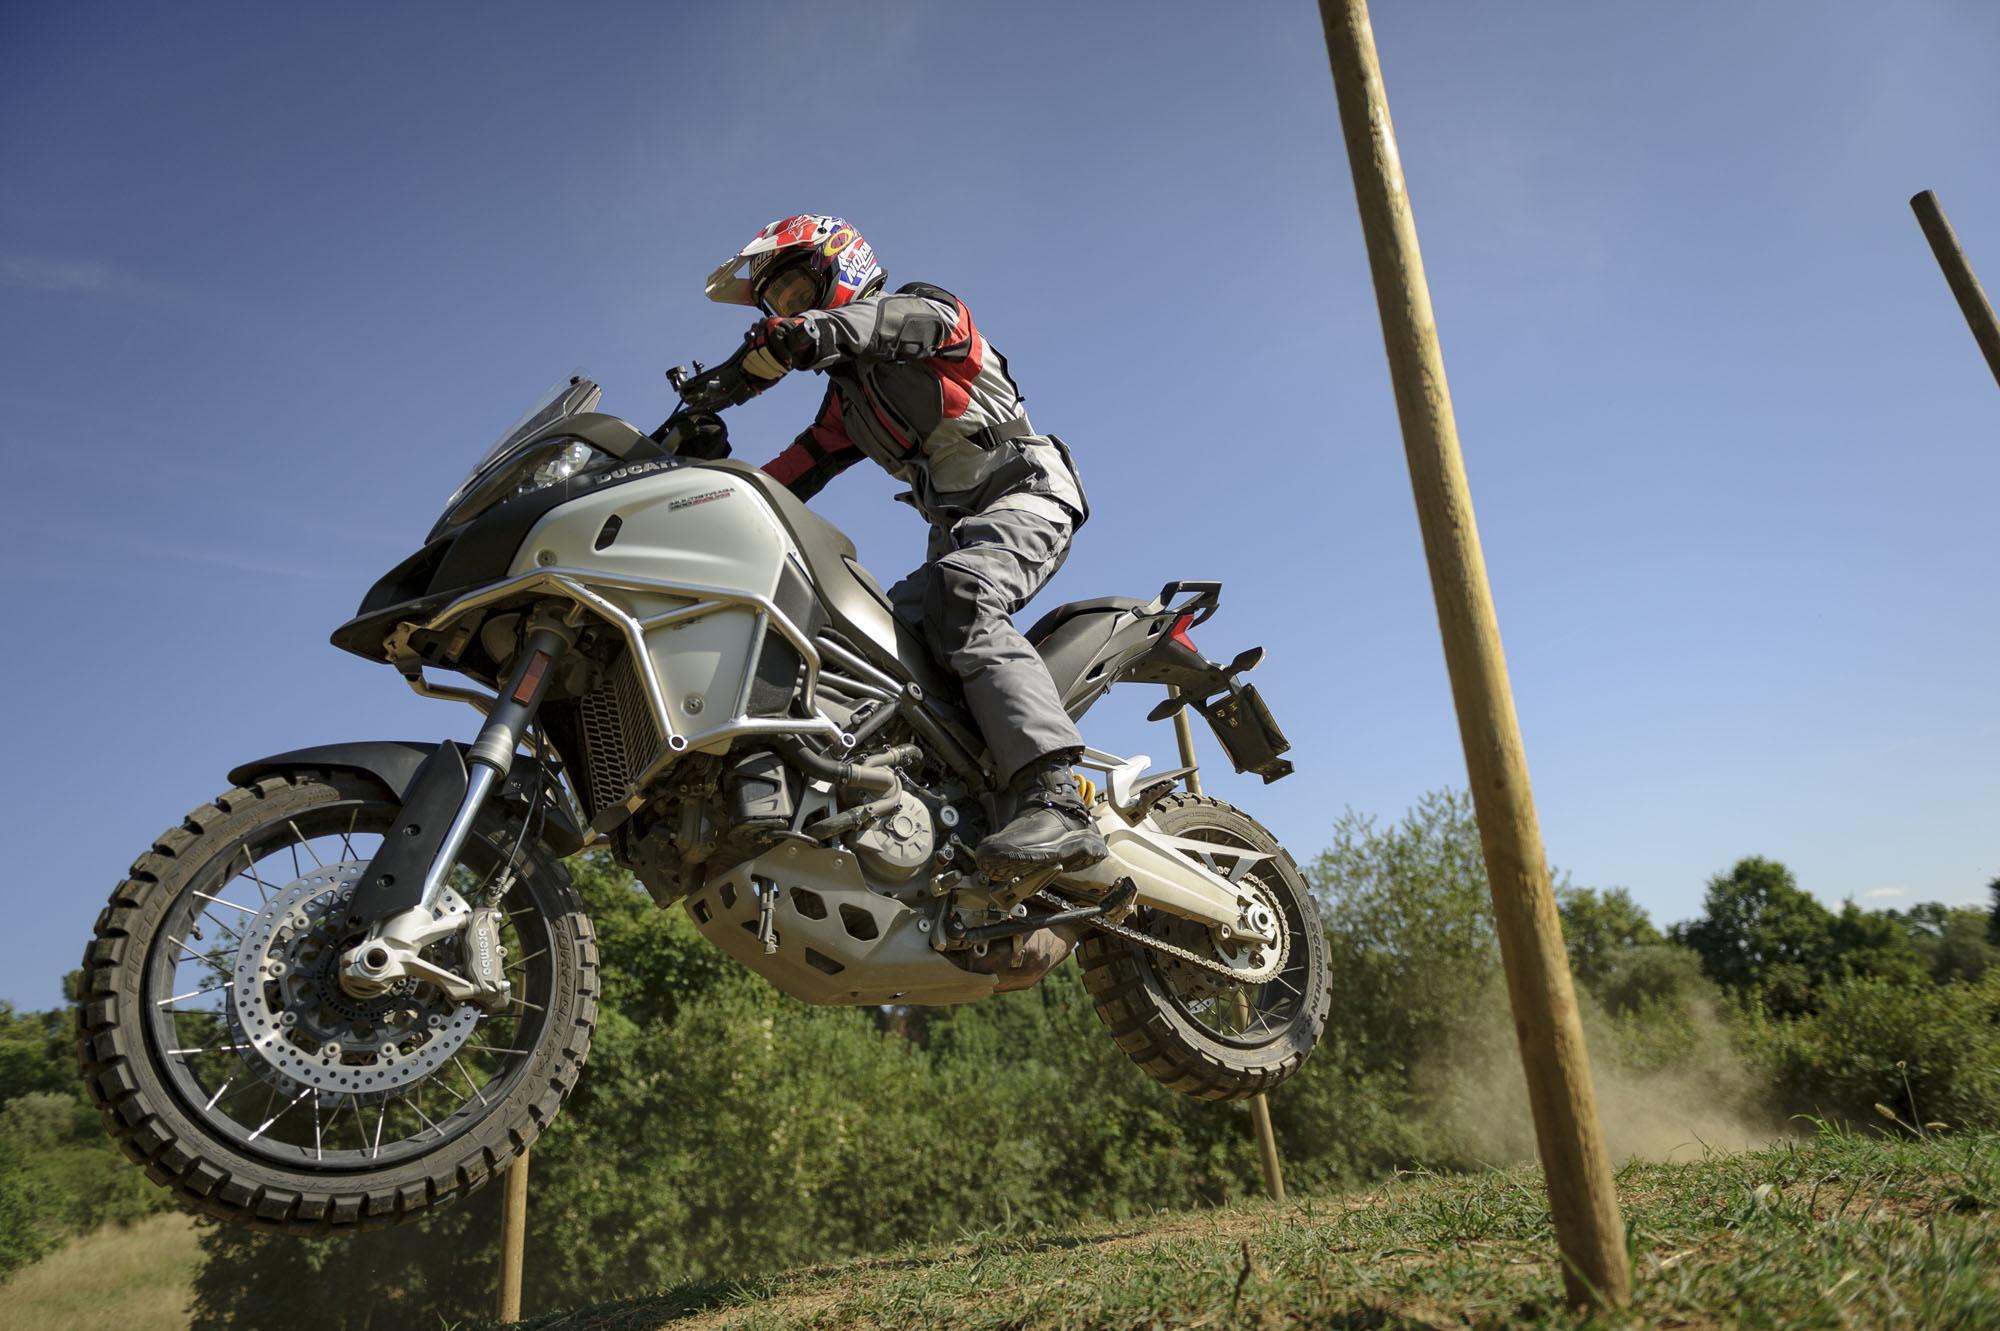 Harley Davidson Gear >> Casey Stoner at DRE Enduro - Bike Review